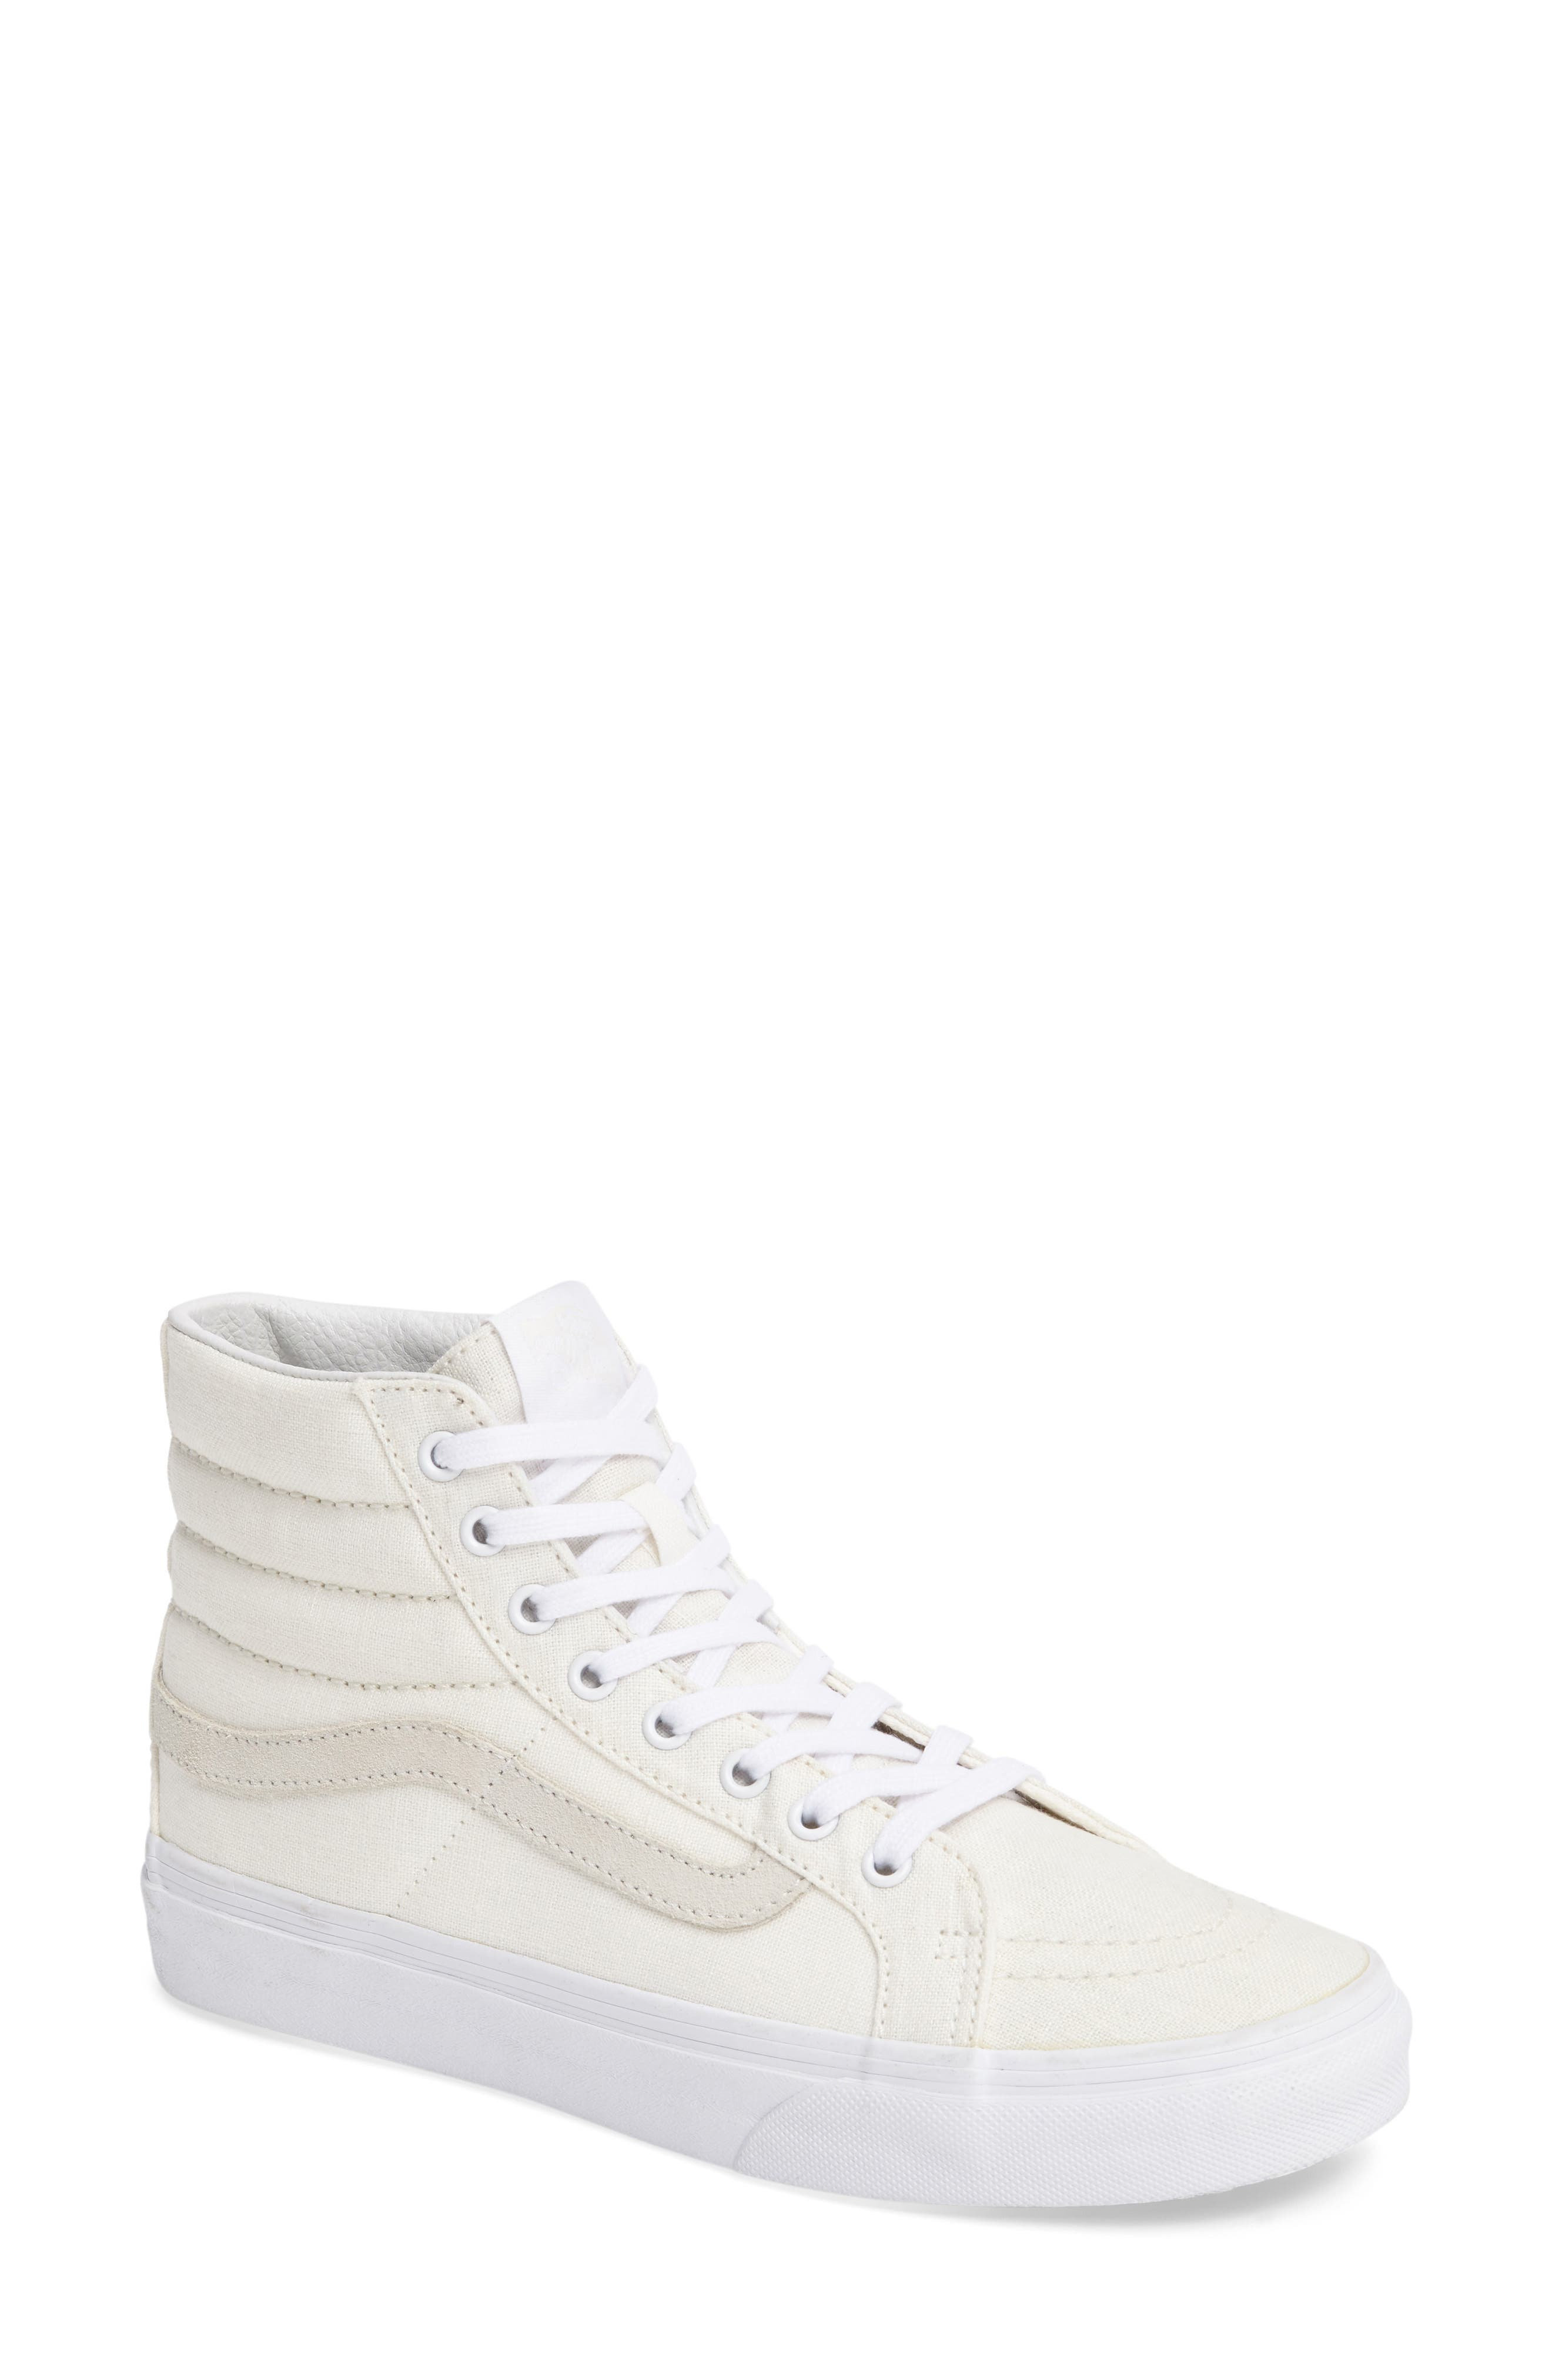 Alternate Image 1 Selected - Vans Sk8-Hi Slim Sneaker (Women)